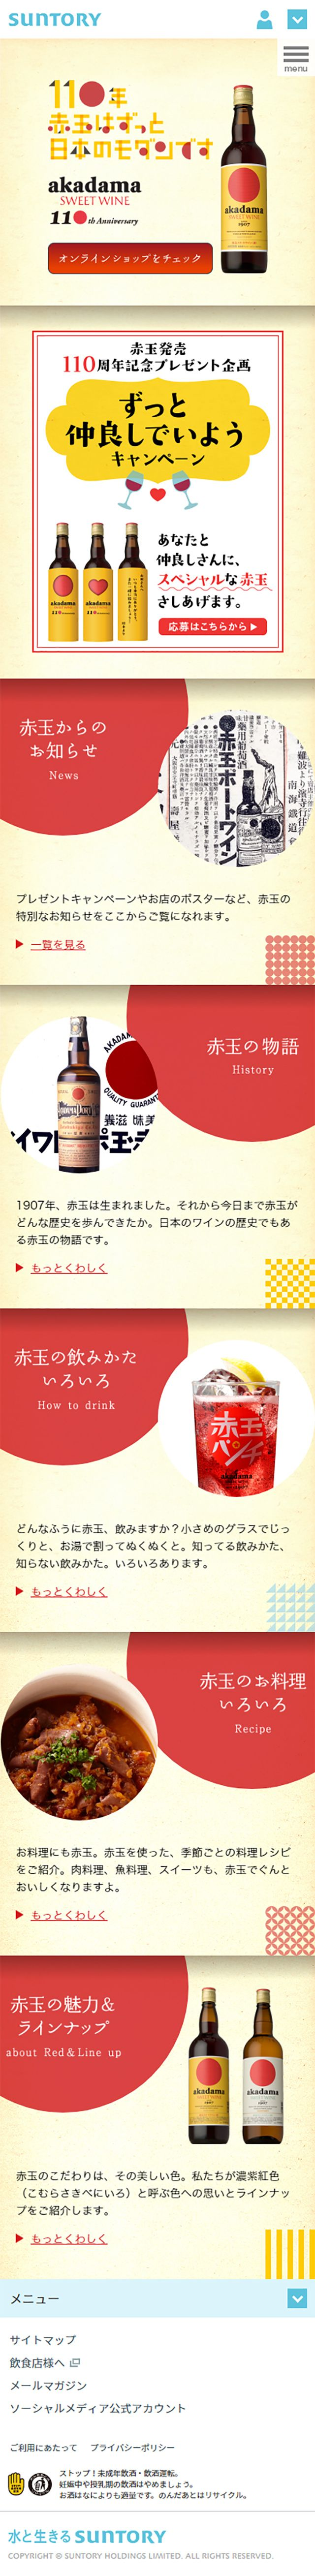 akadama SWEET WINE WEBデザイナーさん必見!スマホランディングページのデザイン参考に(和風系)